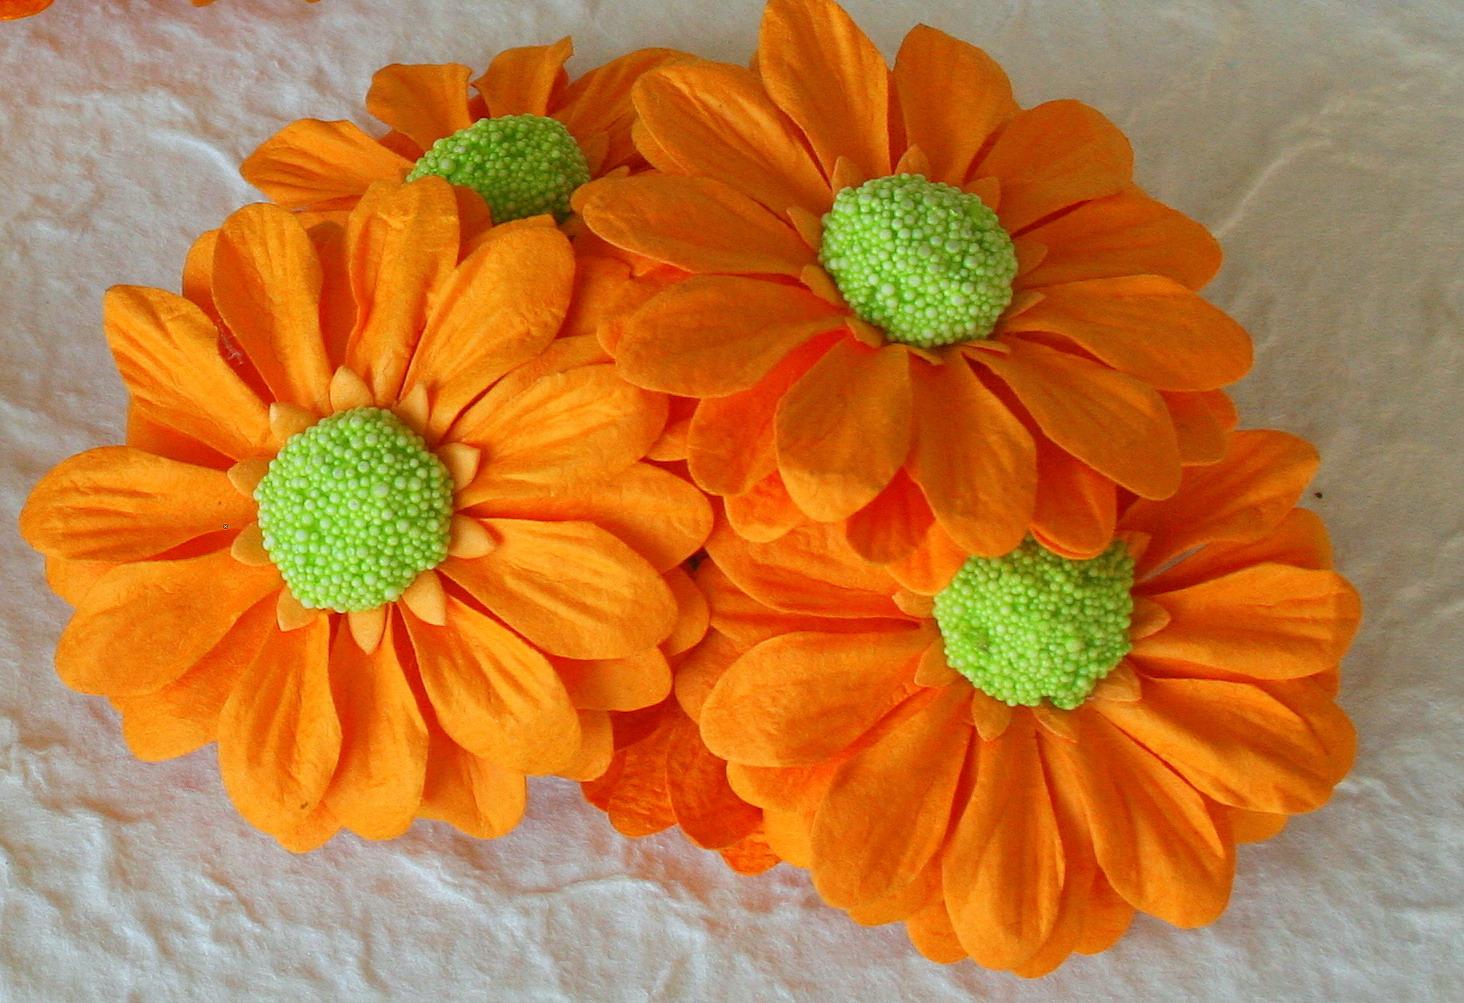 Mulberry Flower - Sunflower-12